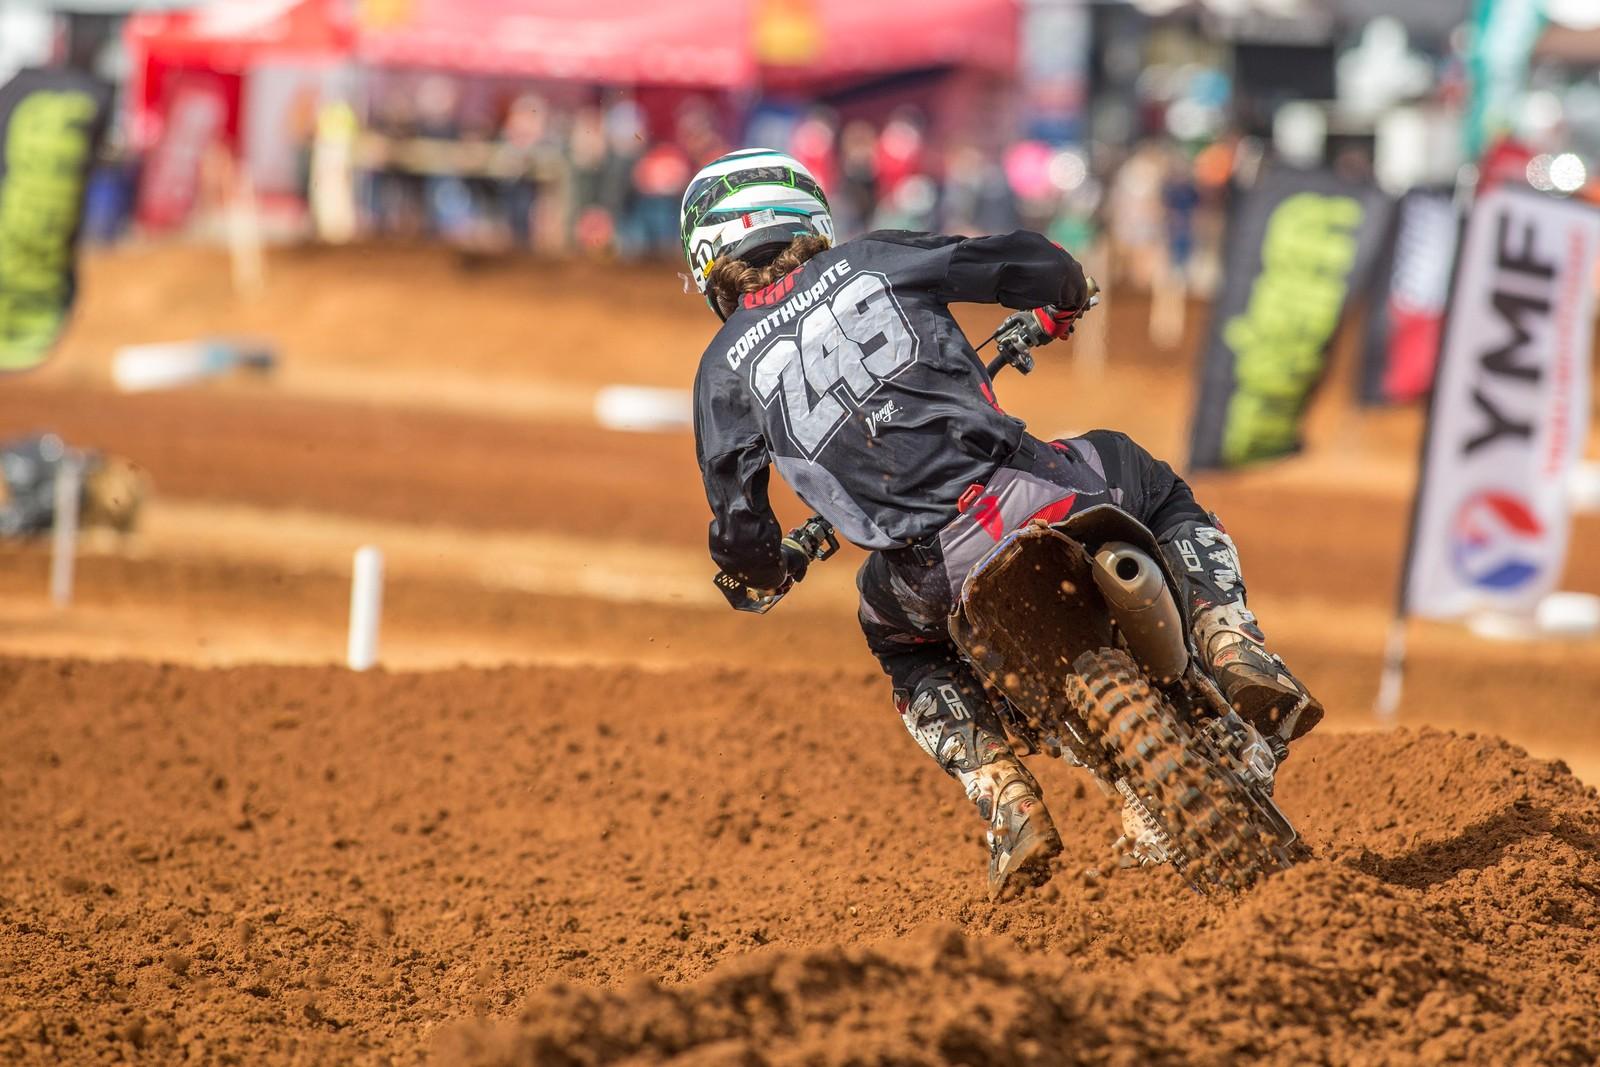 Jed Cornthwaite - Australian Motul Mx Championships: Round 4, Murray Bridge - Motocross Pictures - Vital MX